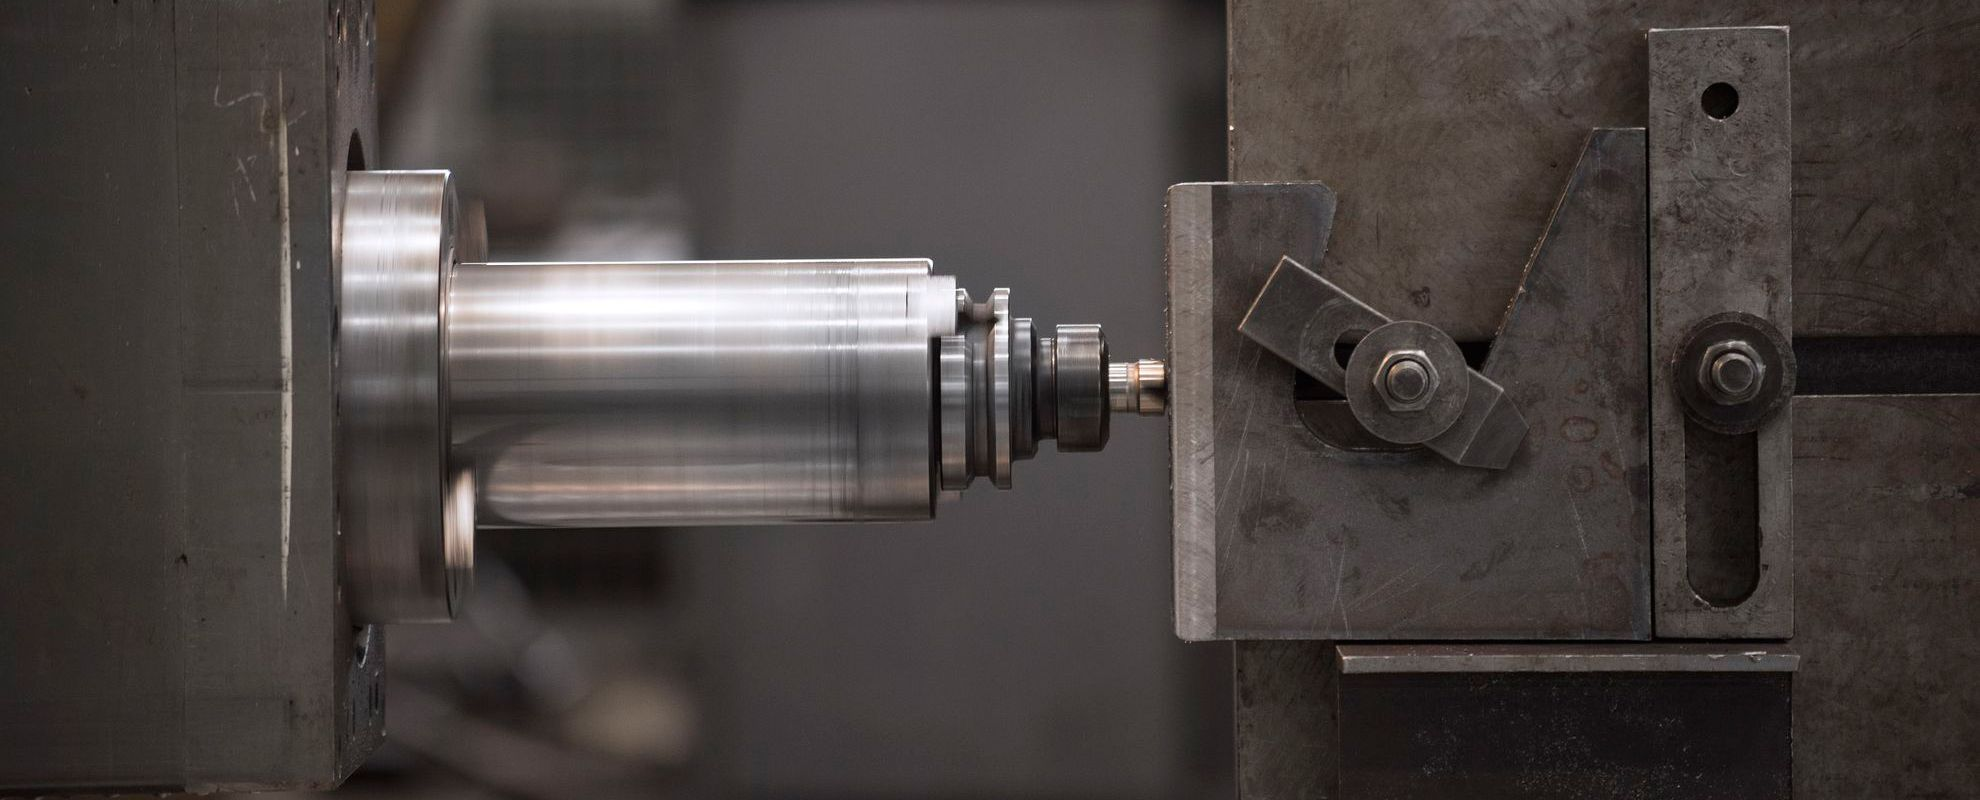 Механична обработка на едрогабаритни стоманени детайли